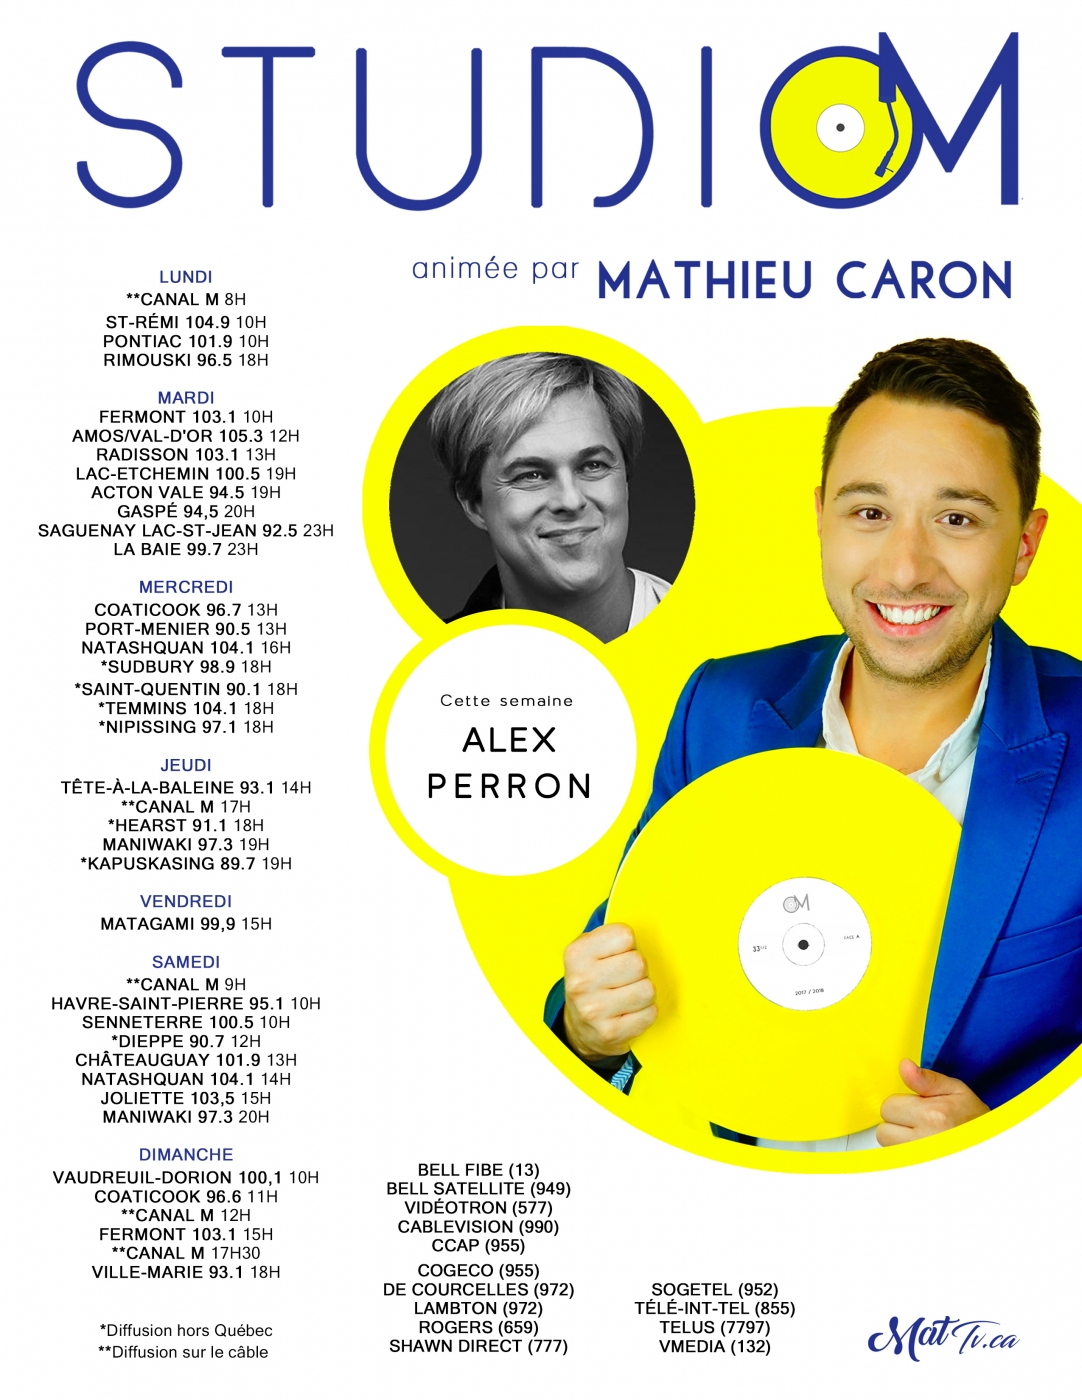 Mathieu 8x11 - Alex Perron 2.0